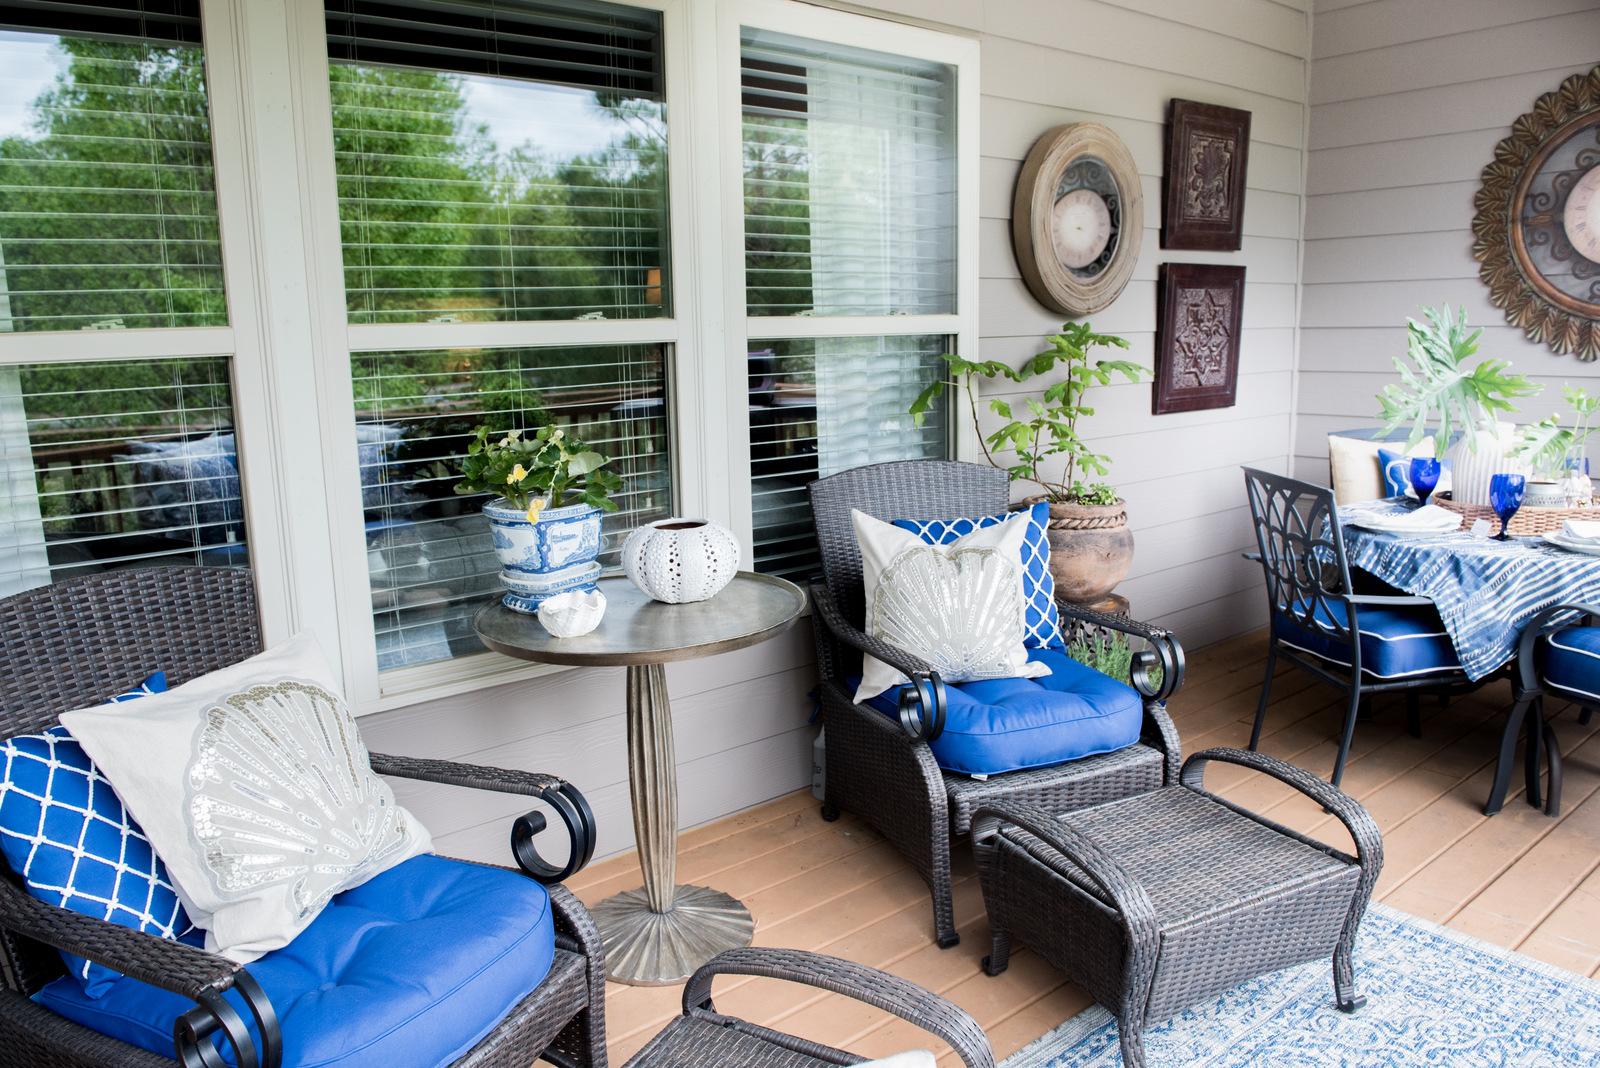 Greekoutdoorlivingroom | House of Valentina-26.jpg